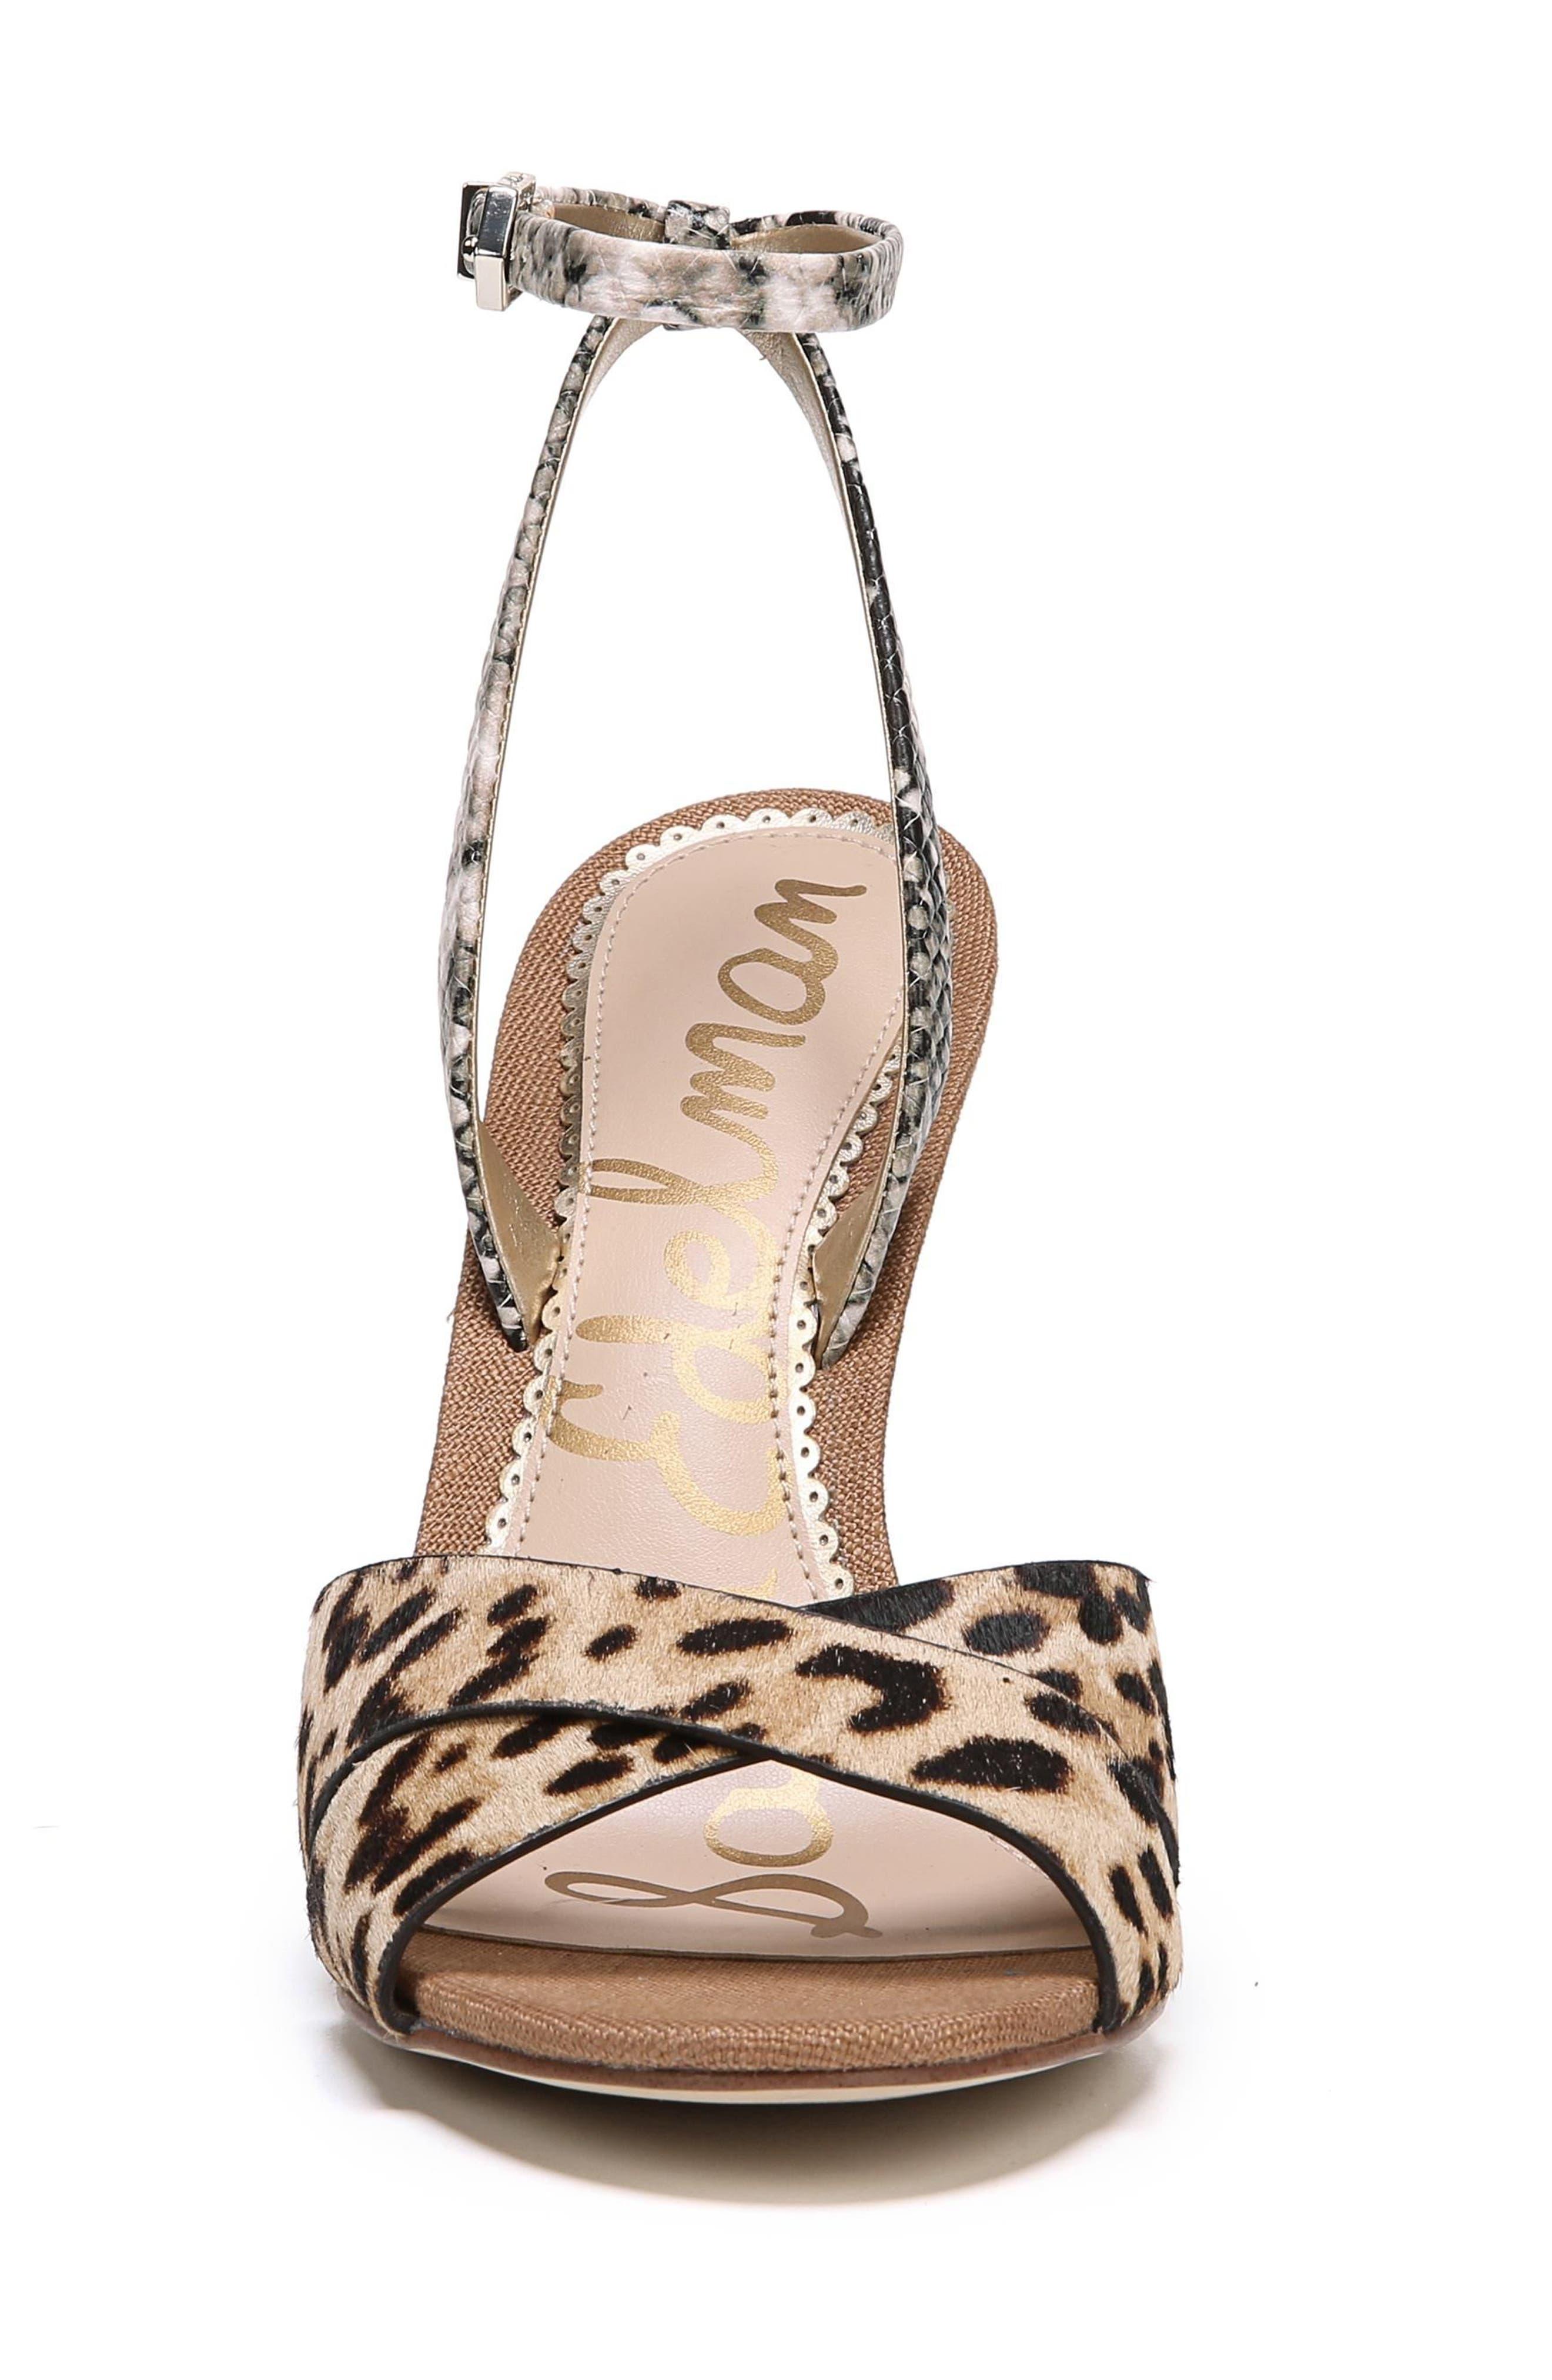 Aly Ankle Strap Sandal,                             Alternate thumbnail 4, color,                             Leopard Print Calf Hair